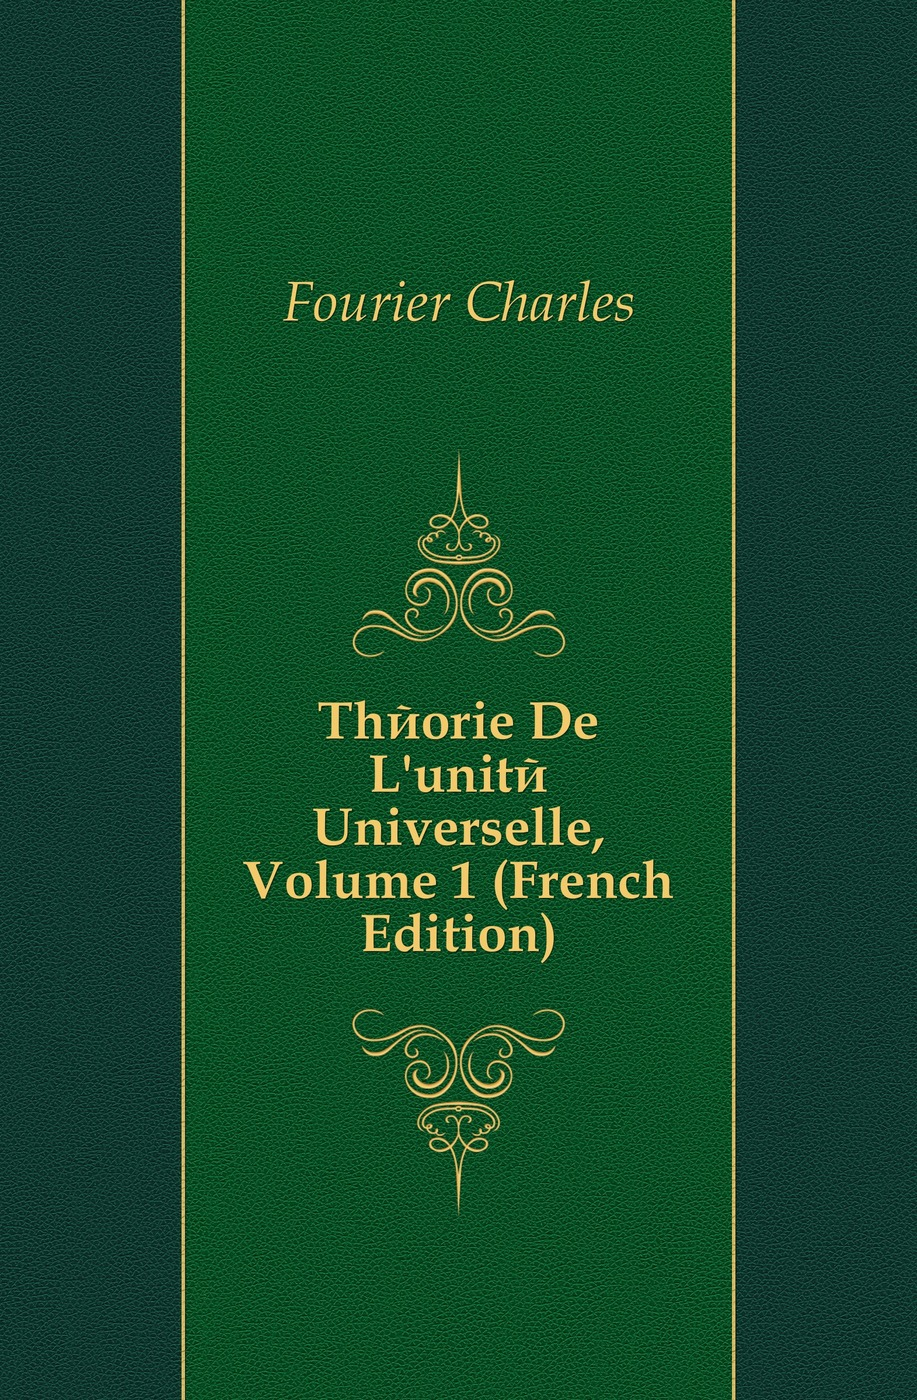 Fourier Charles Theorie De L'unite Universelle, Volume 1 (French Edition) fourier charles theorie de l association et de l unite universelle french edition